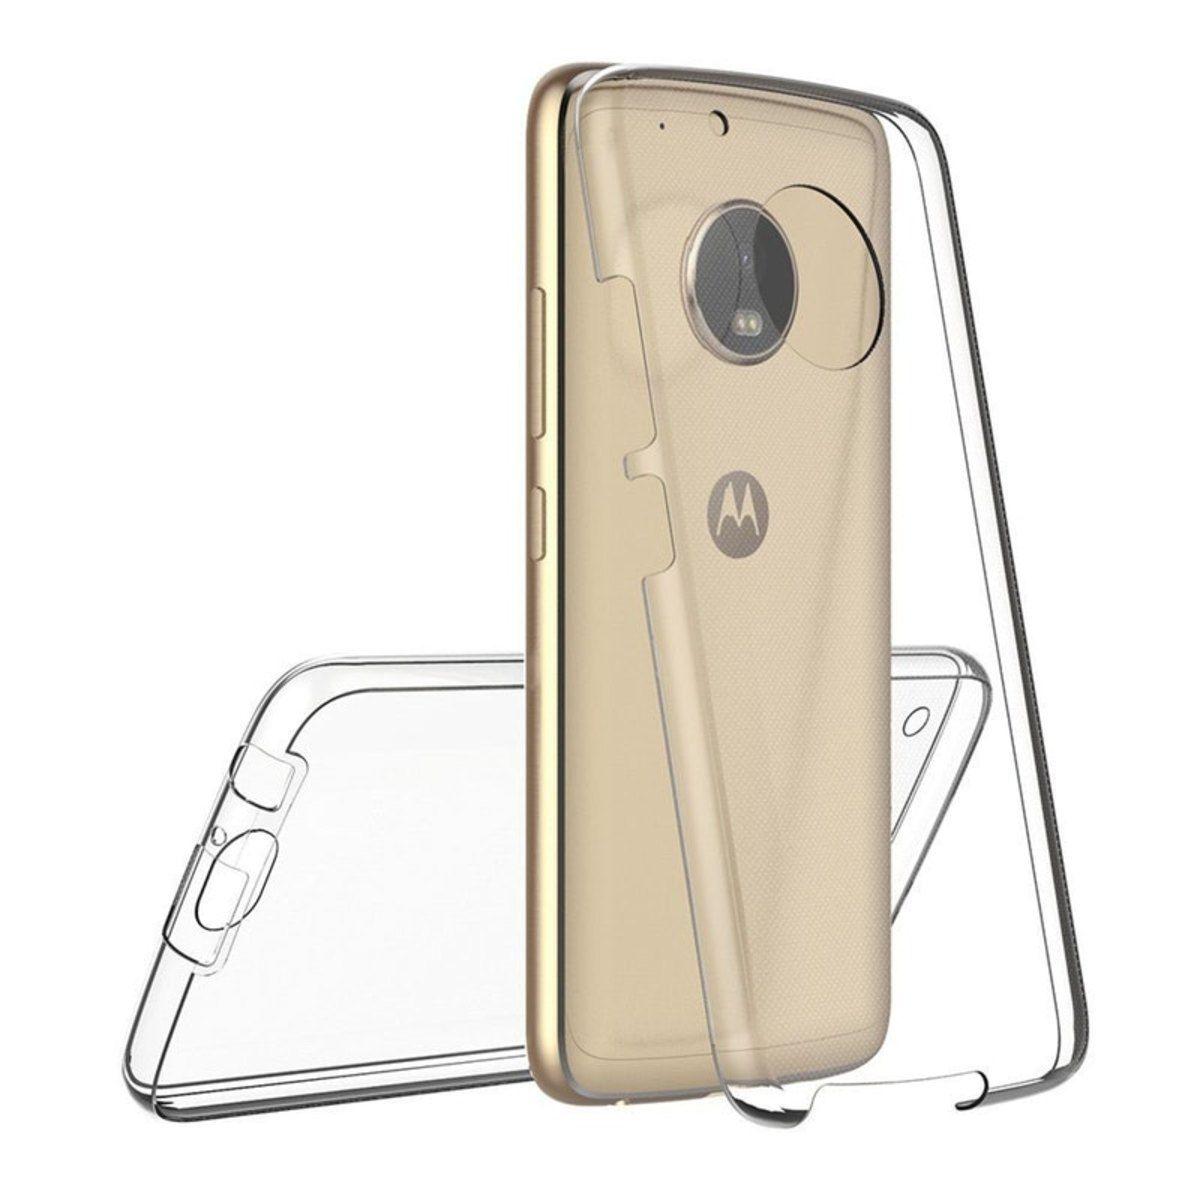 Capinha Motorola G1 G2 G3 G4 G5 G5S PLUS G6 G7 360° Frente Verso